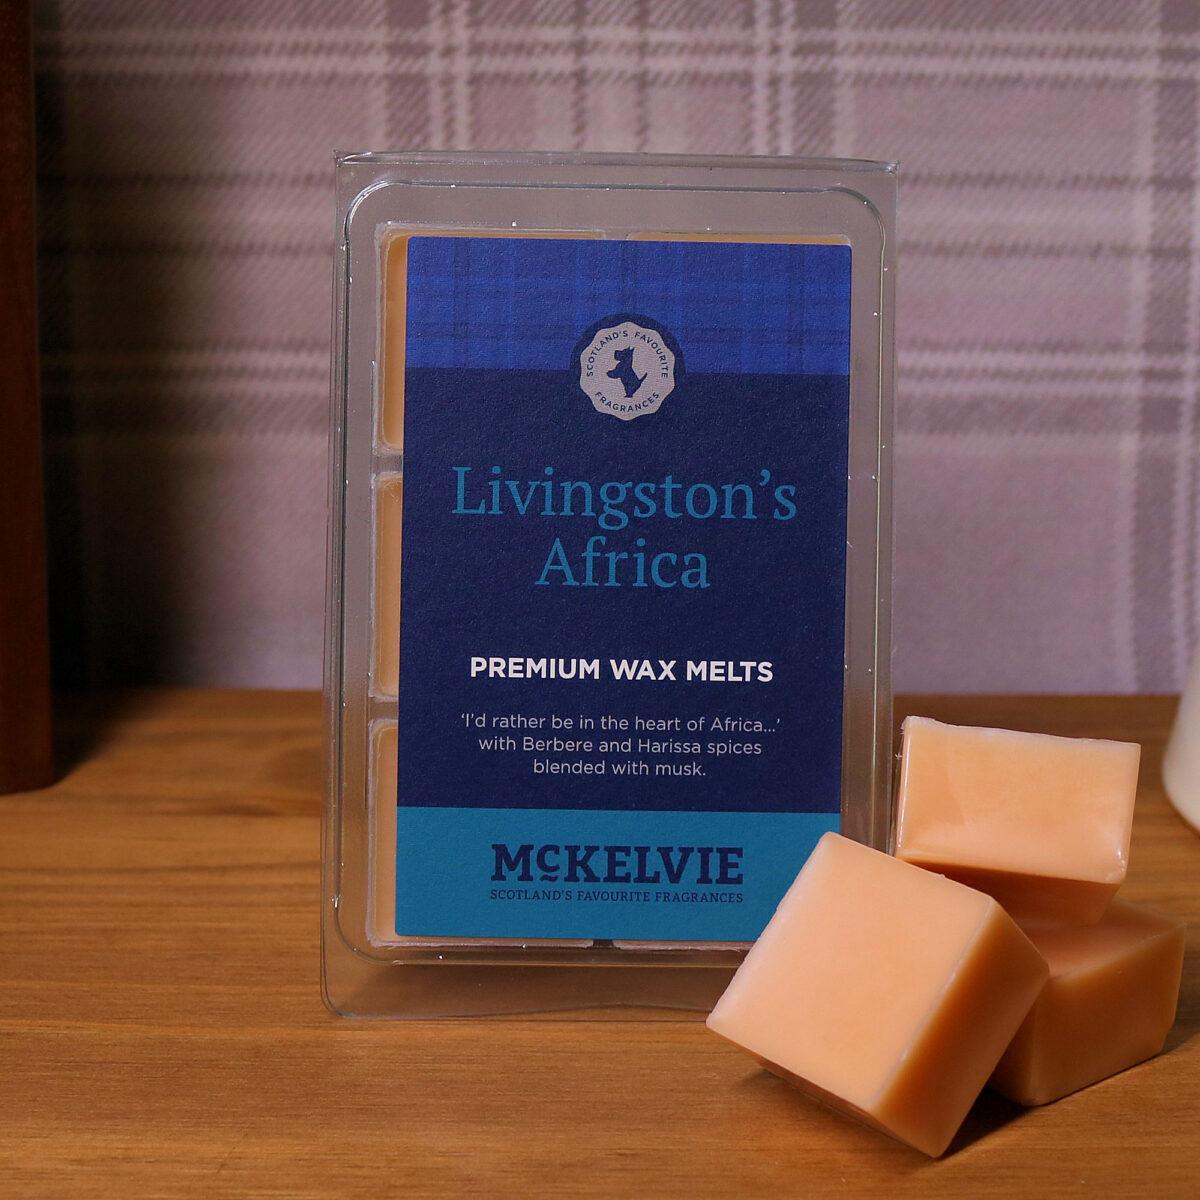 Livingstone's Africa Wax Melts